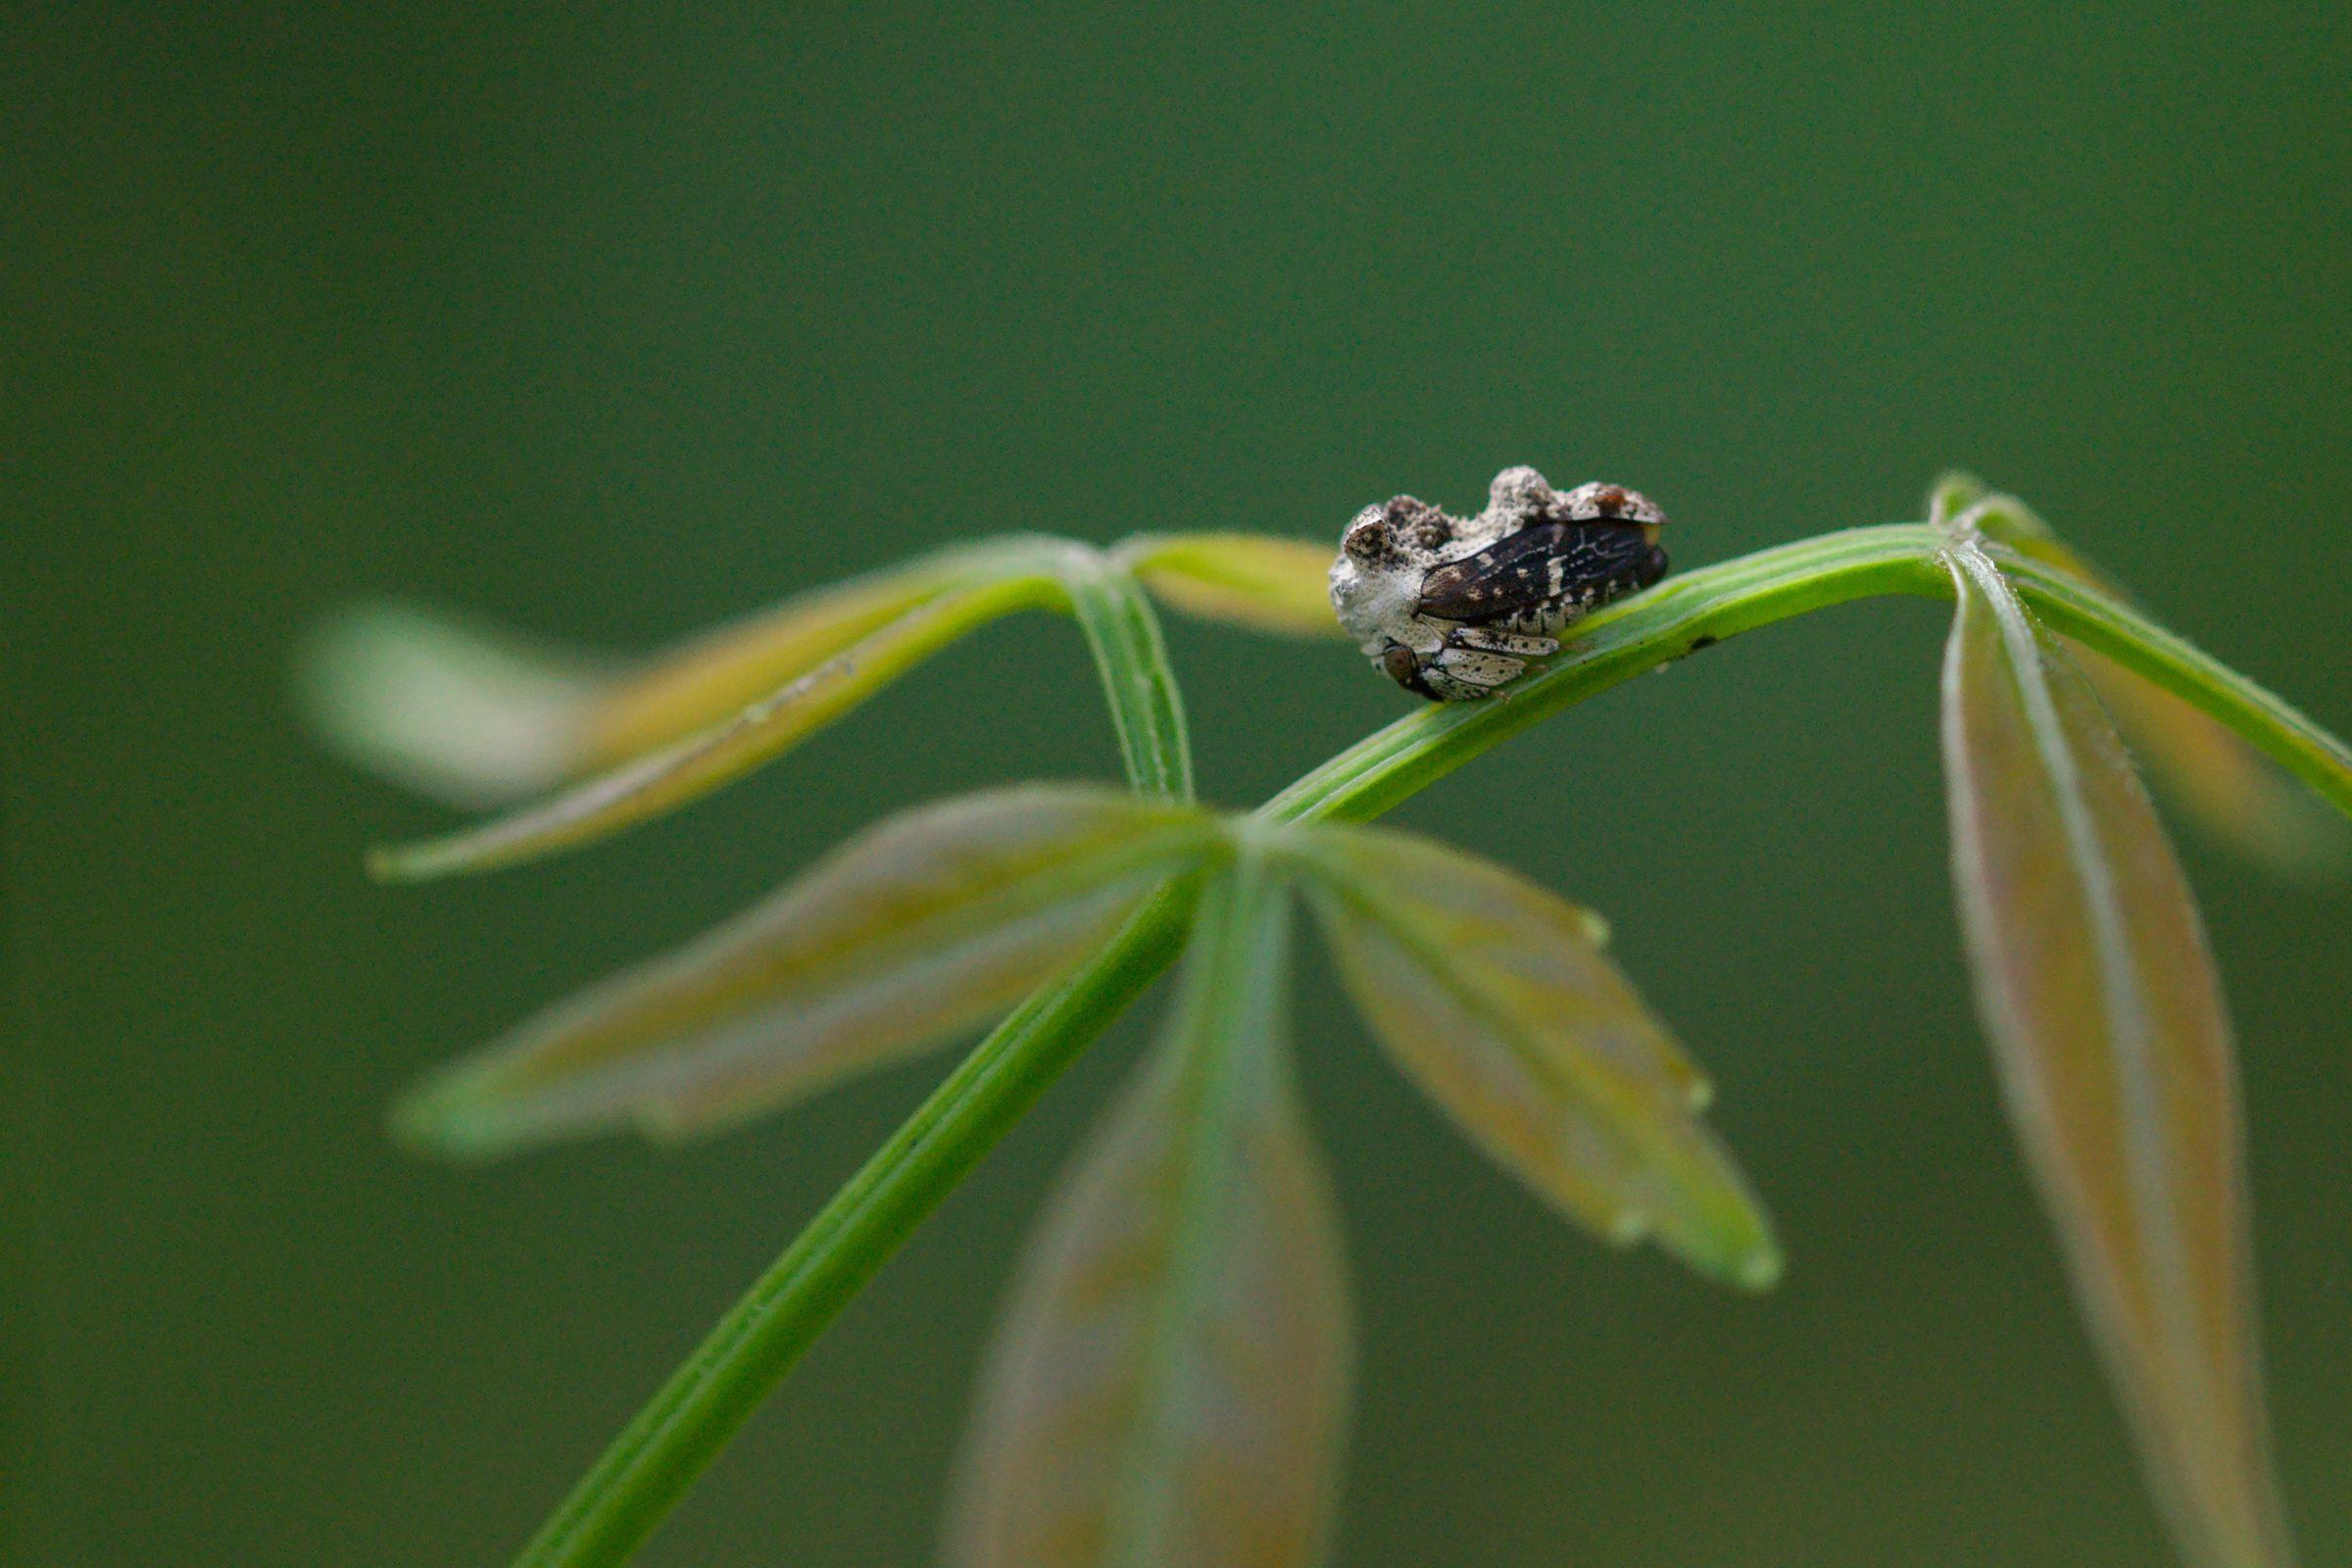 "<a href=""/notocera-bituberculata"" target=""_blank"" rel=""noopener noreferrer""><i>Notocera bituberculata</i> (Buckelzirpe)</a>"